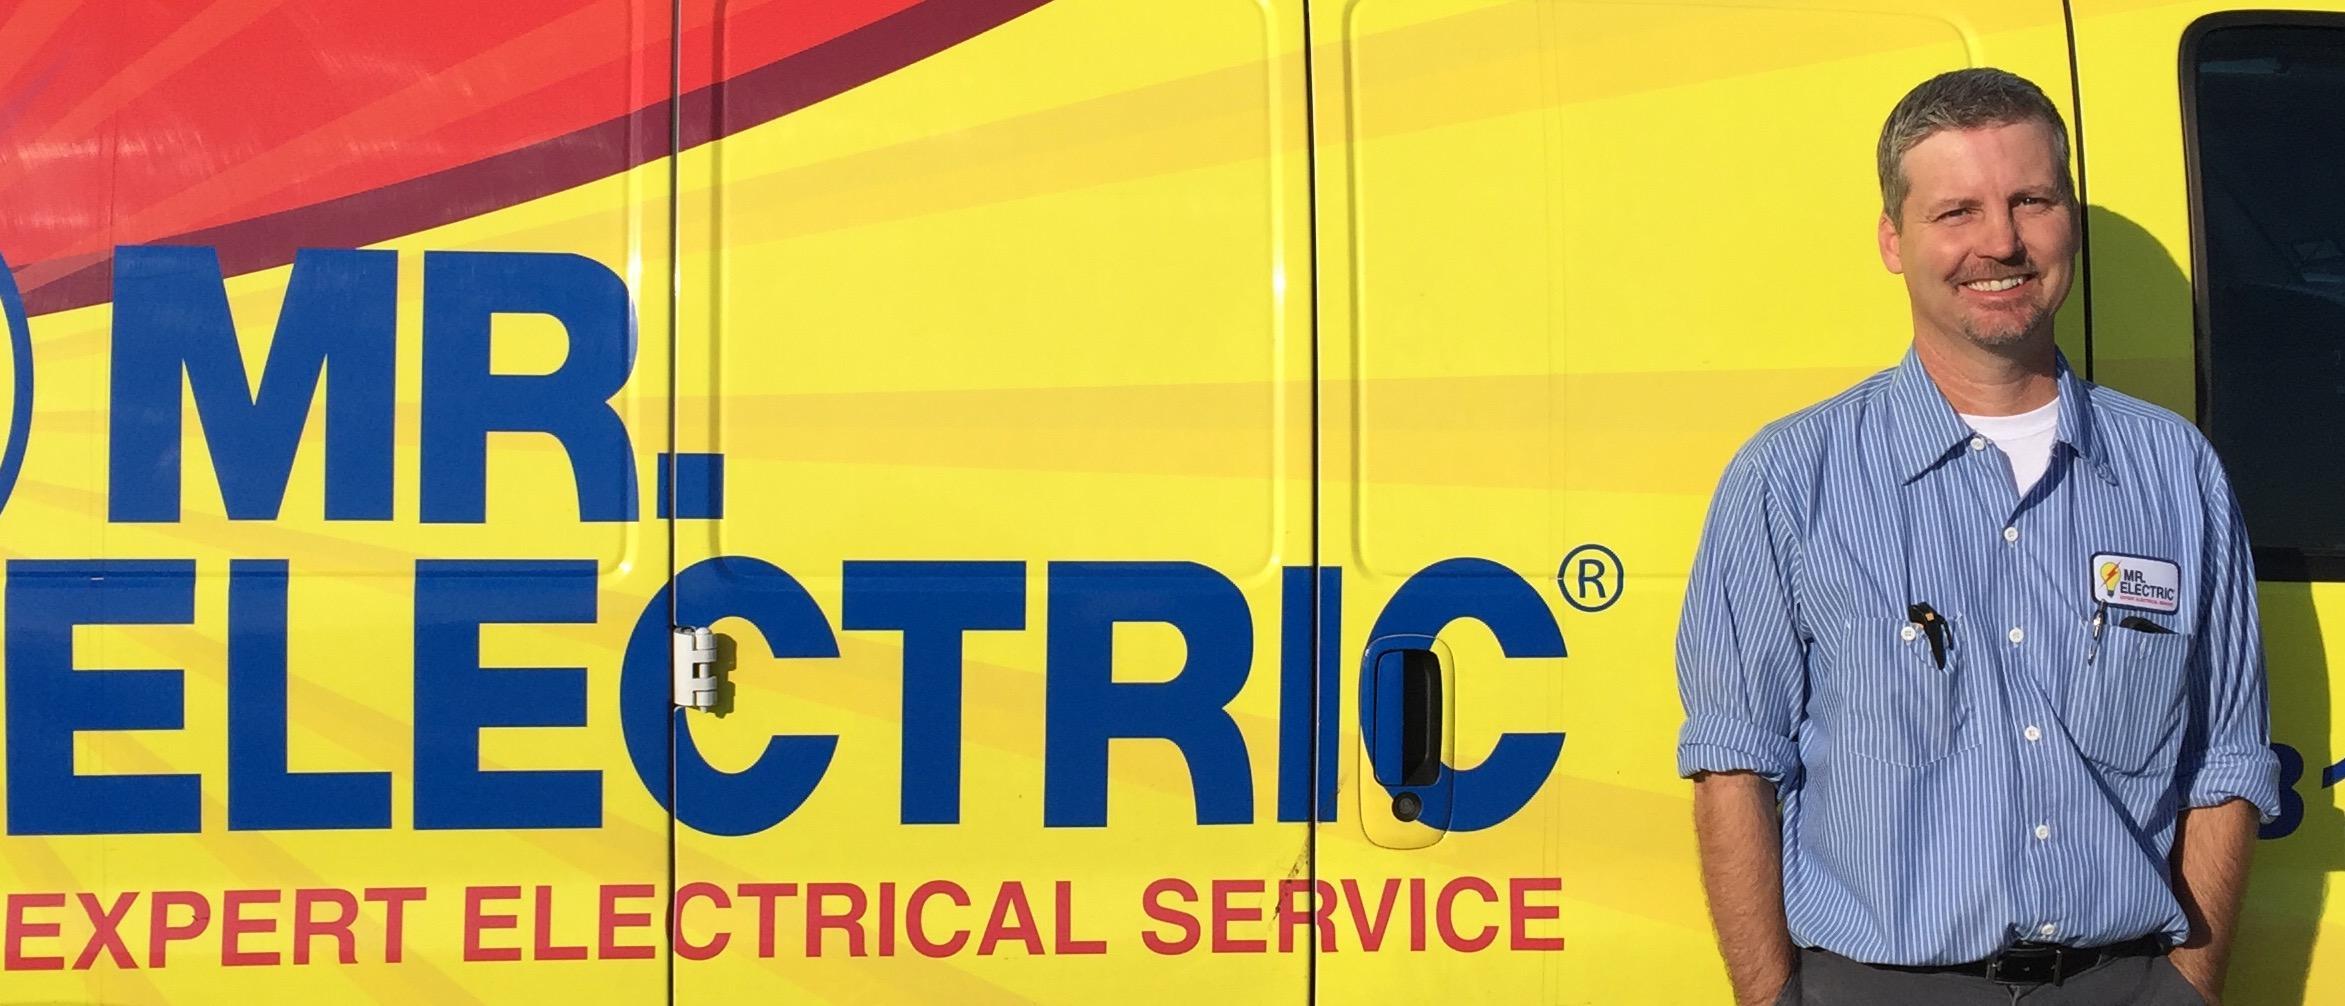 Mr. Electric image 30